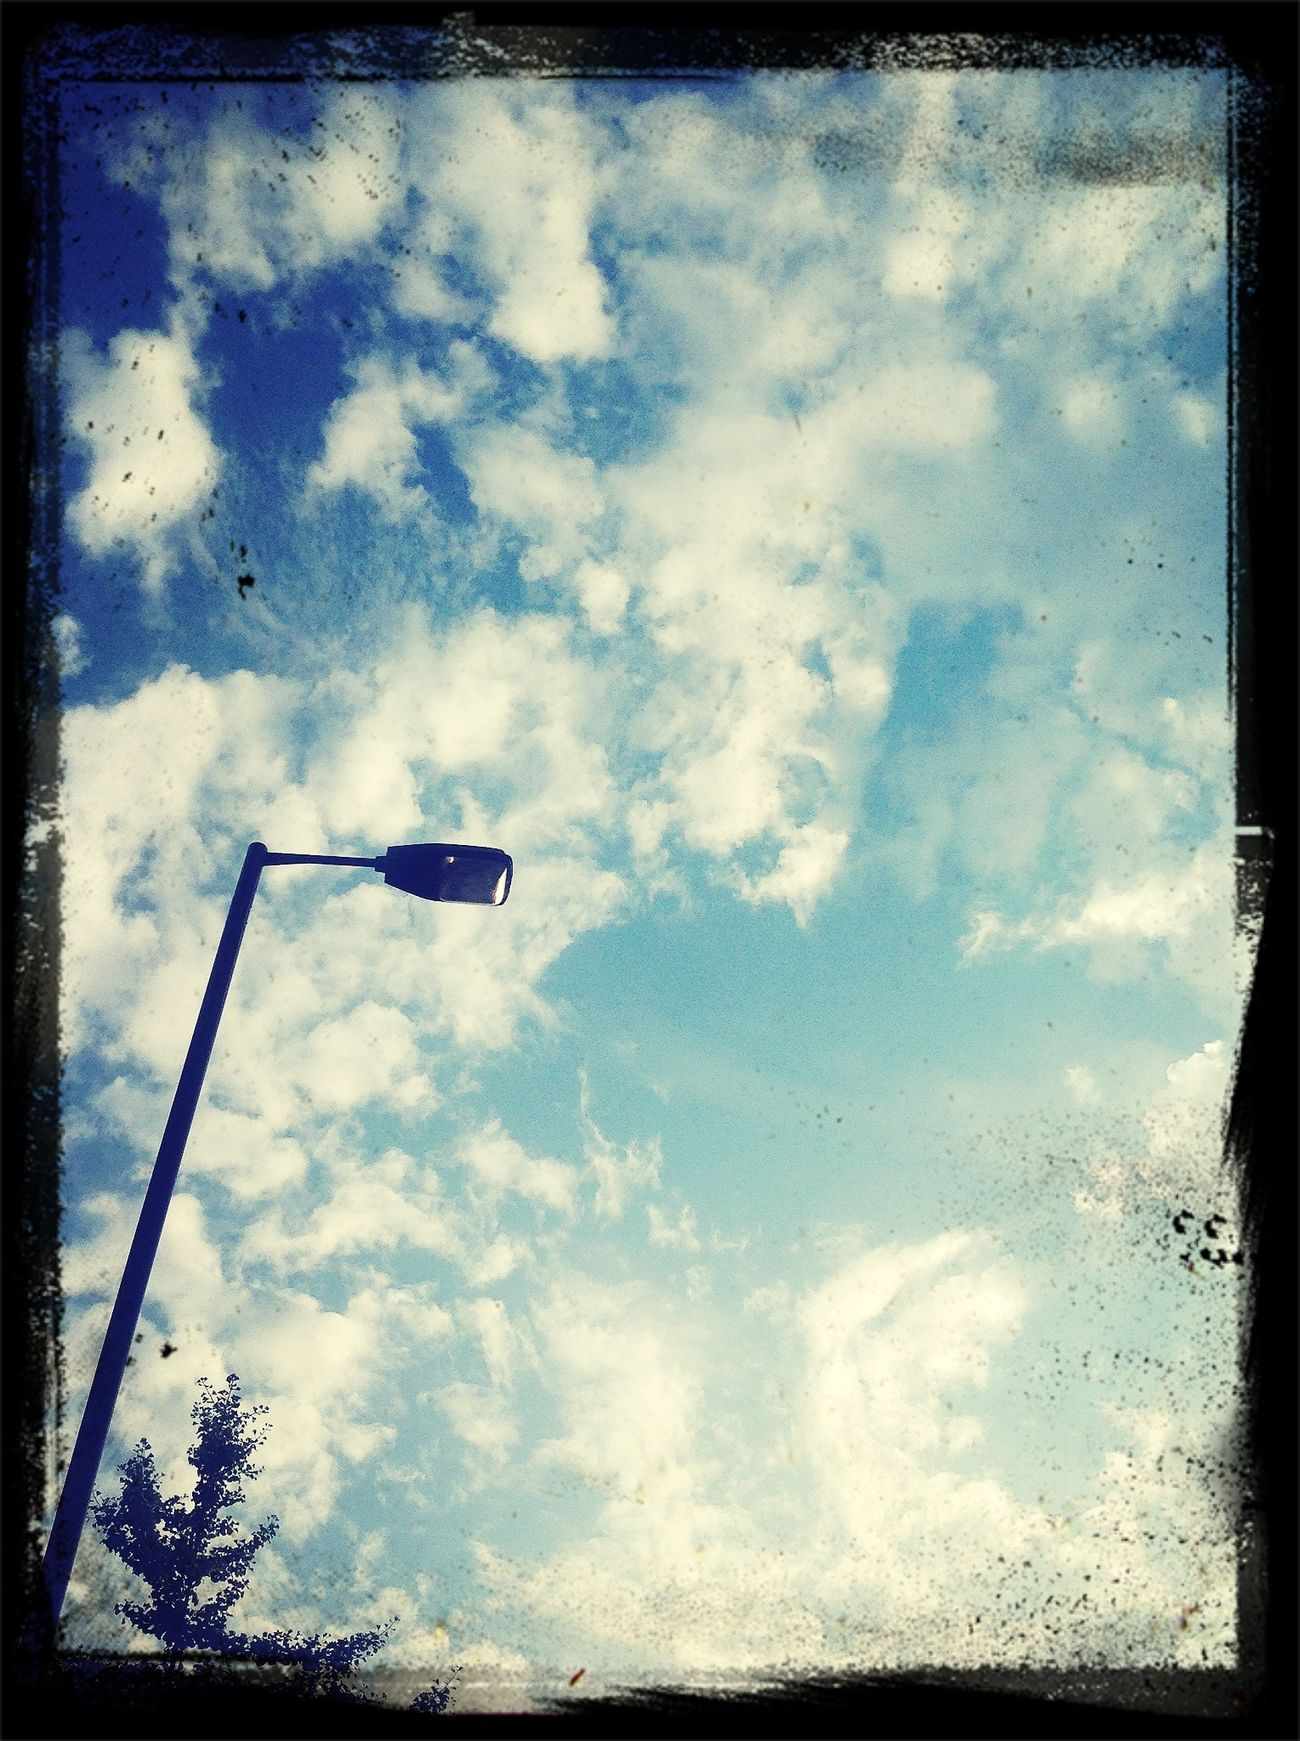 sky:lamp:tree